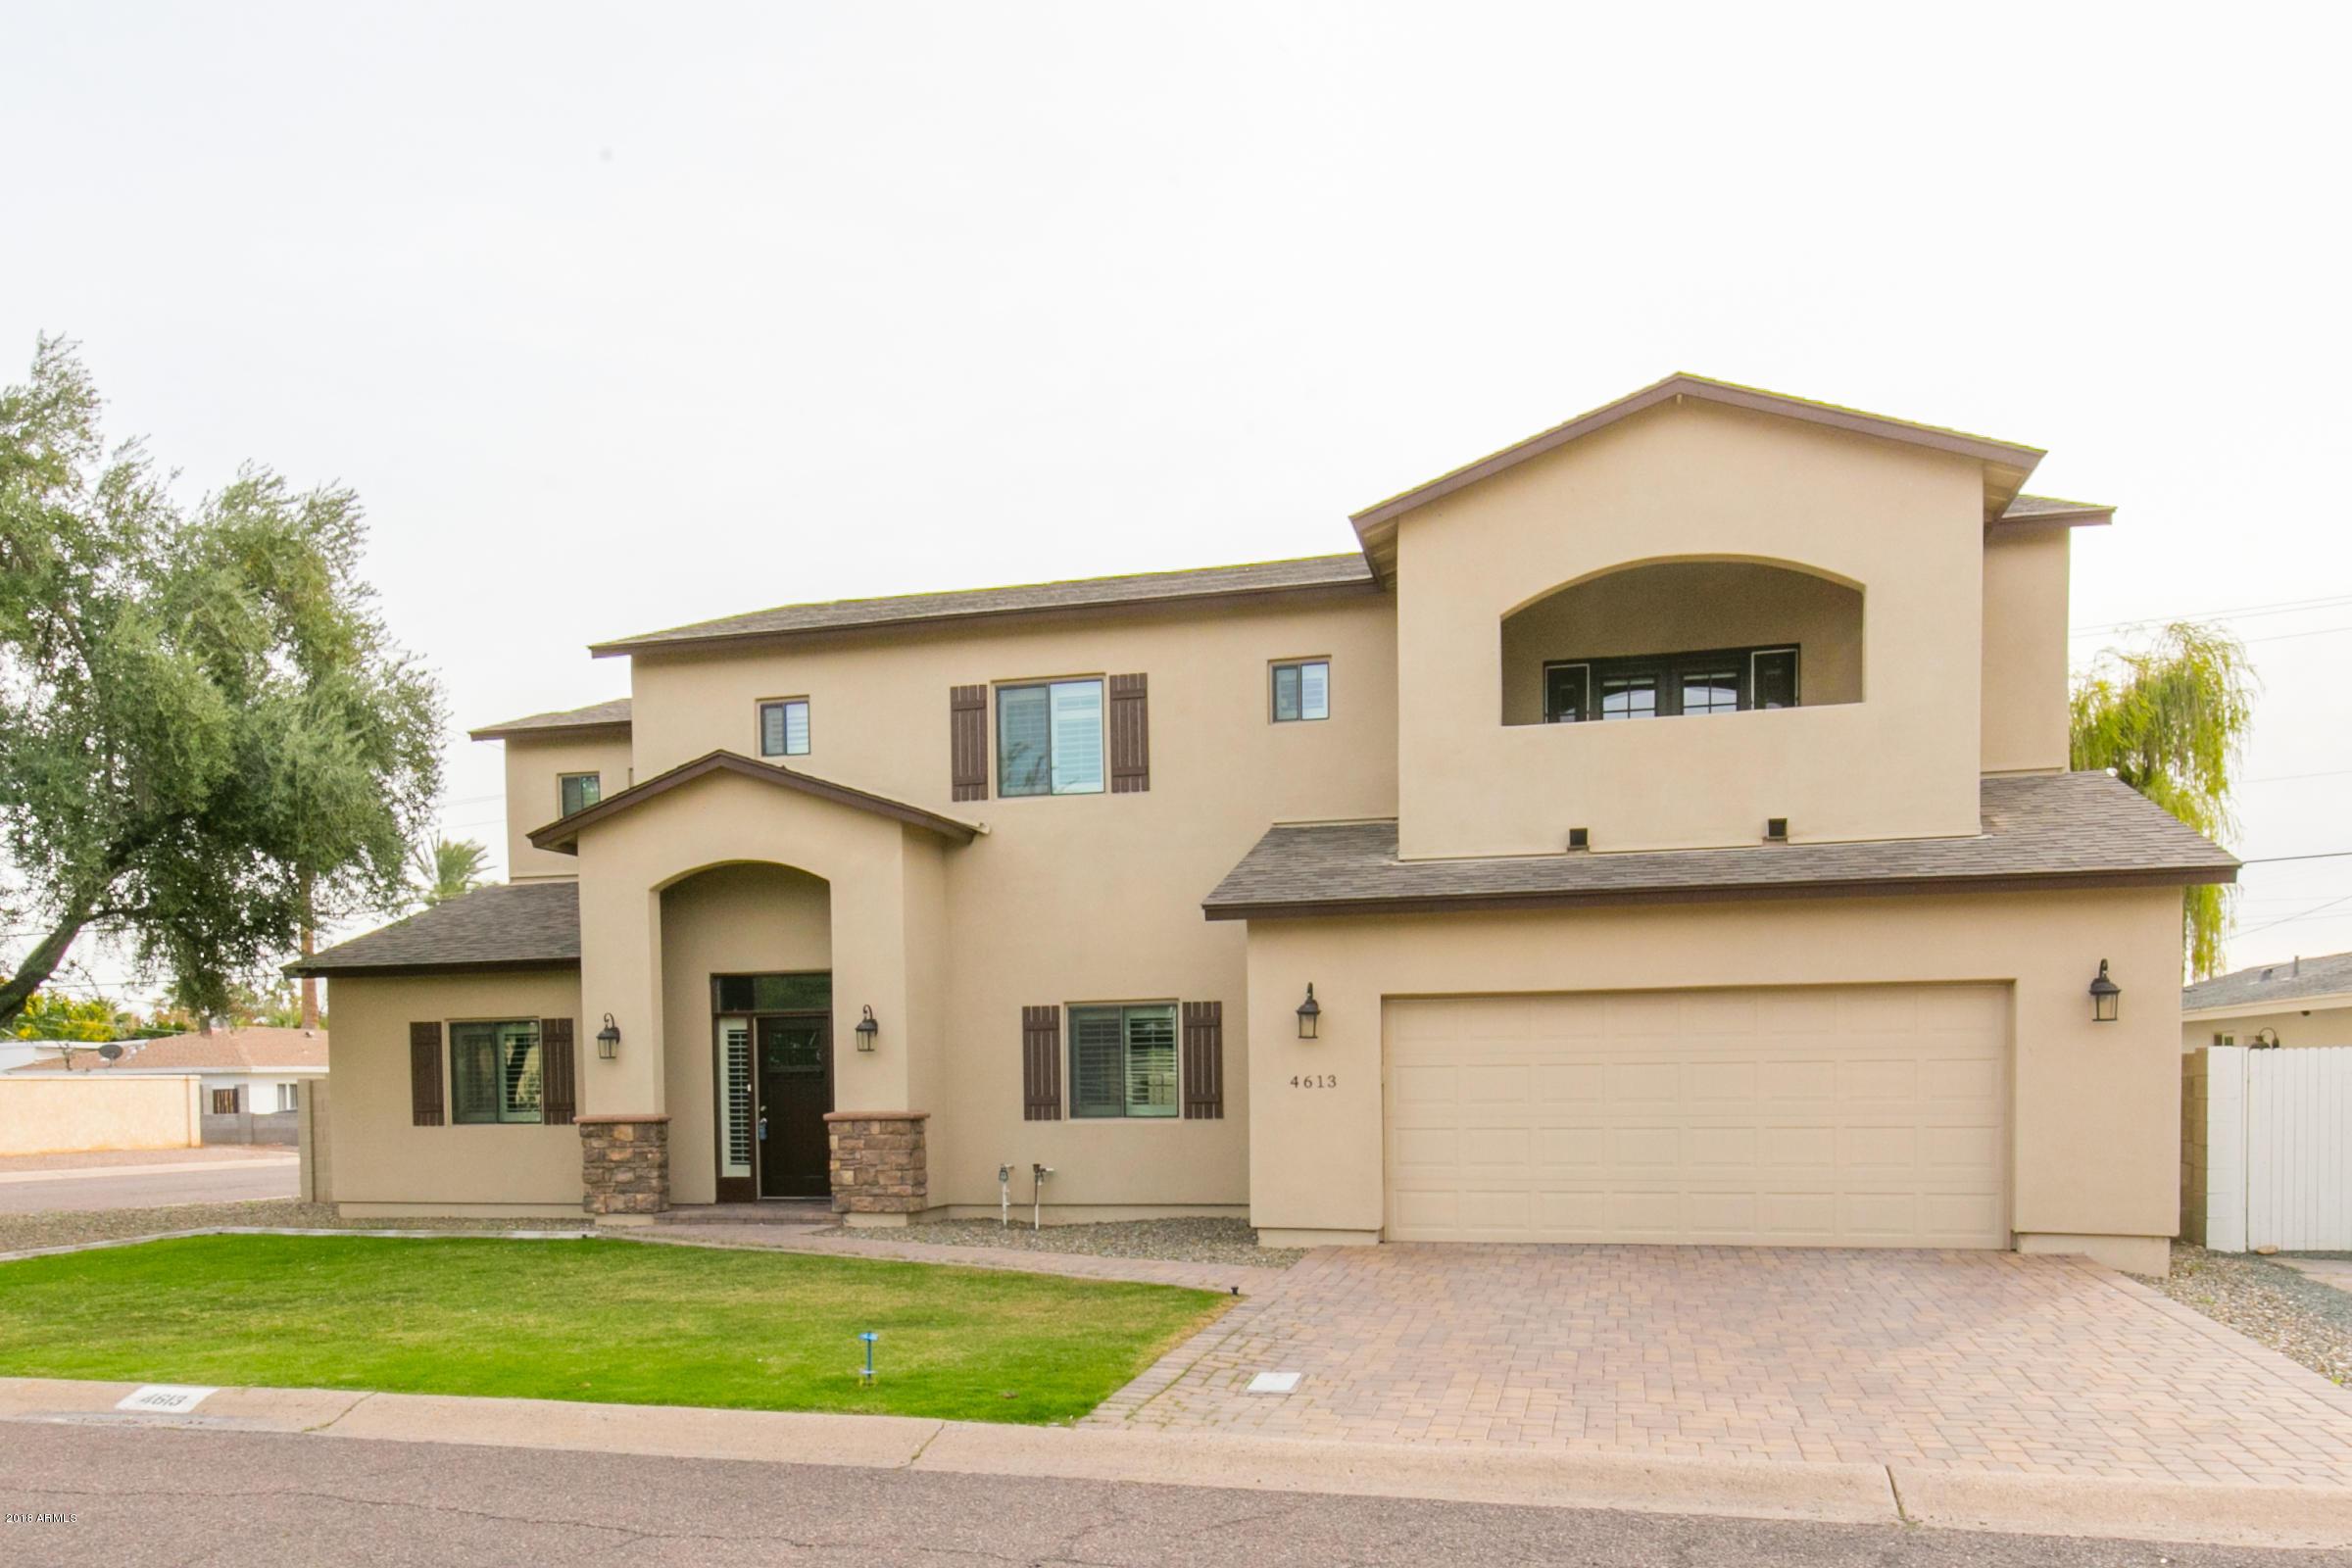 Photo of 4613 E DEVONSHIRE Avenue, Phoenix, AZ 85018